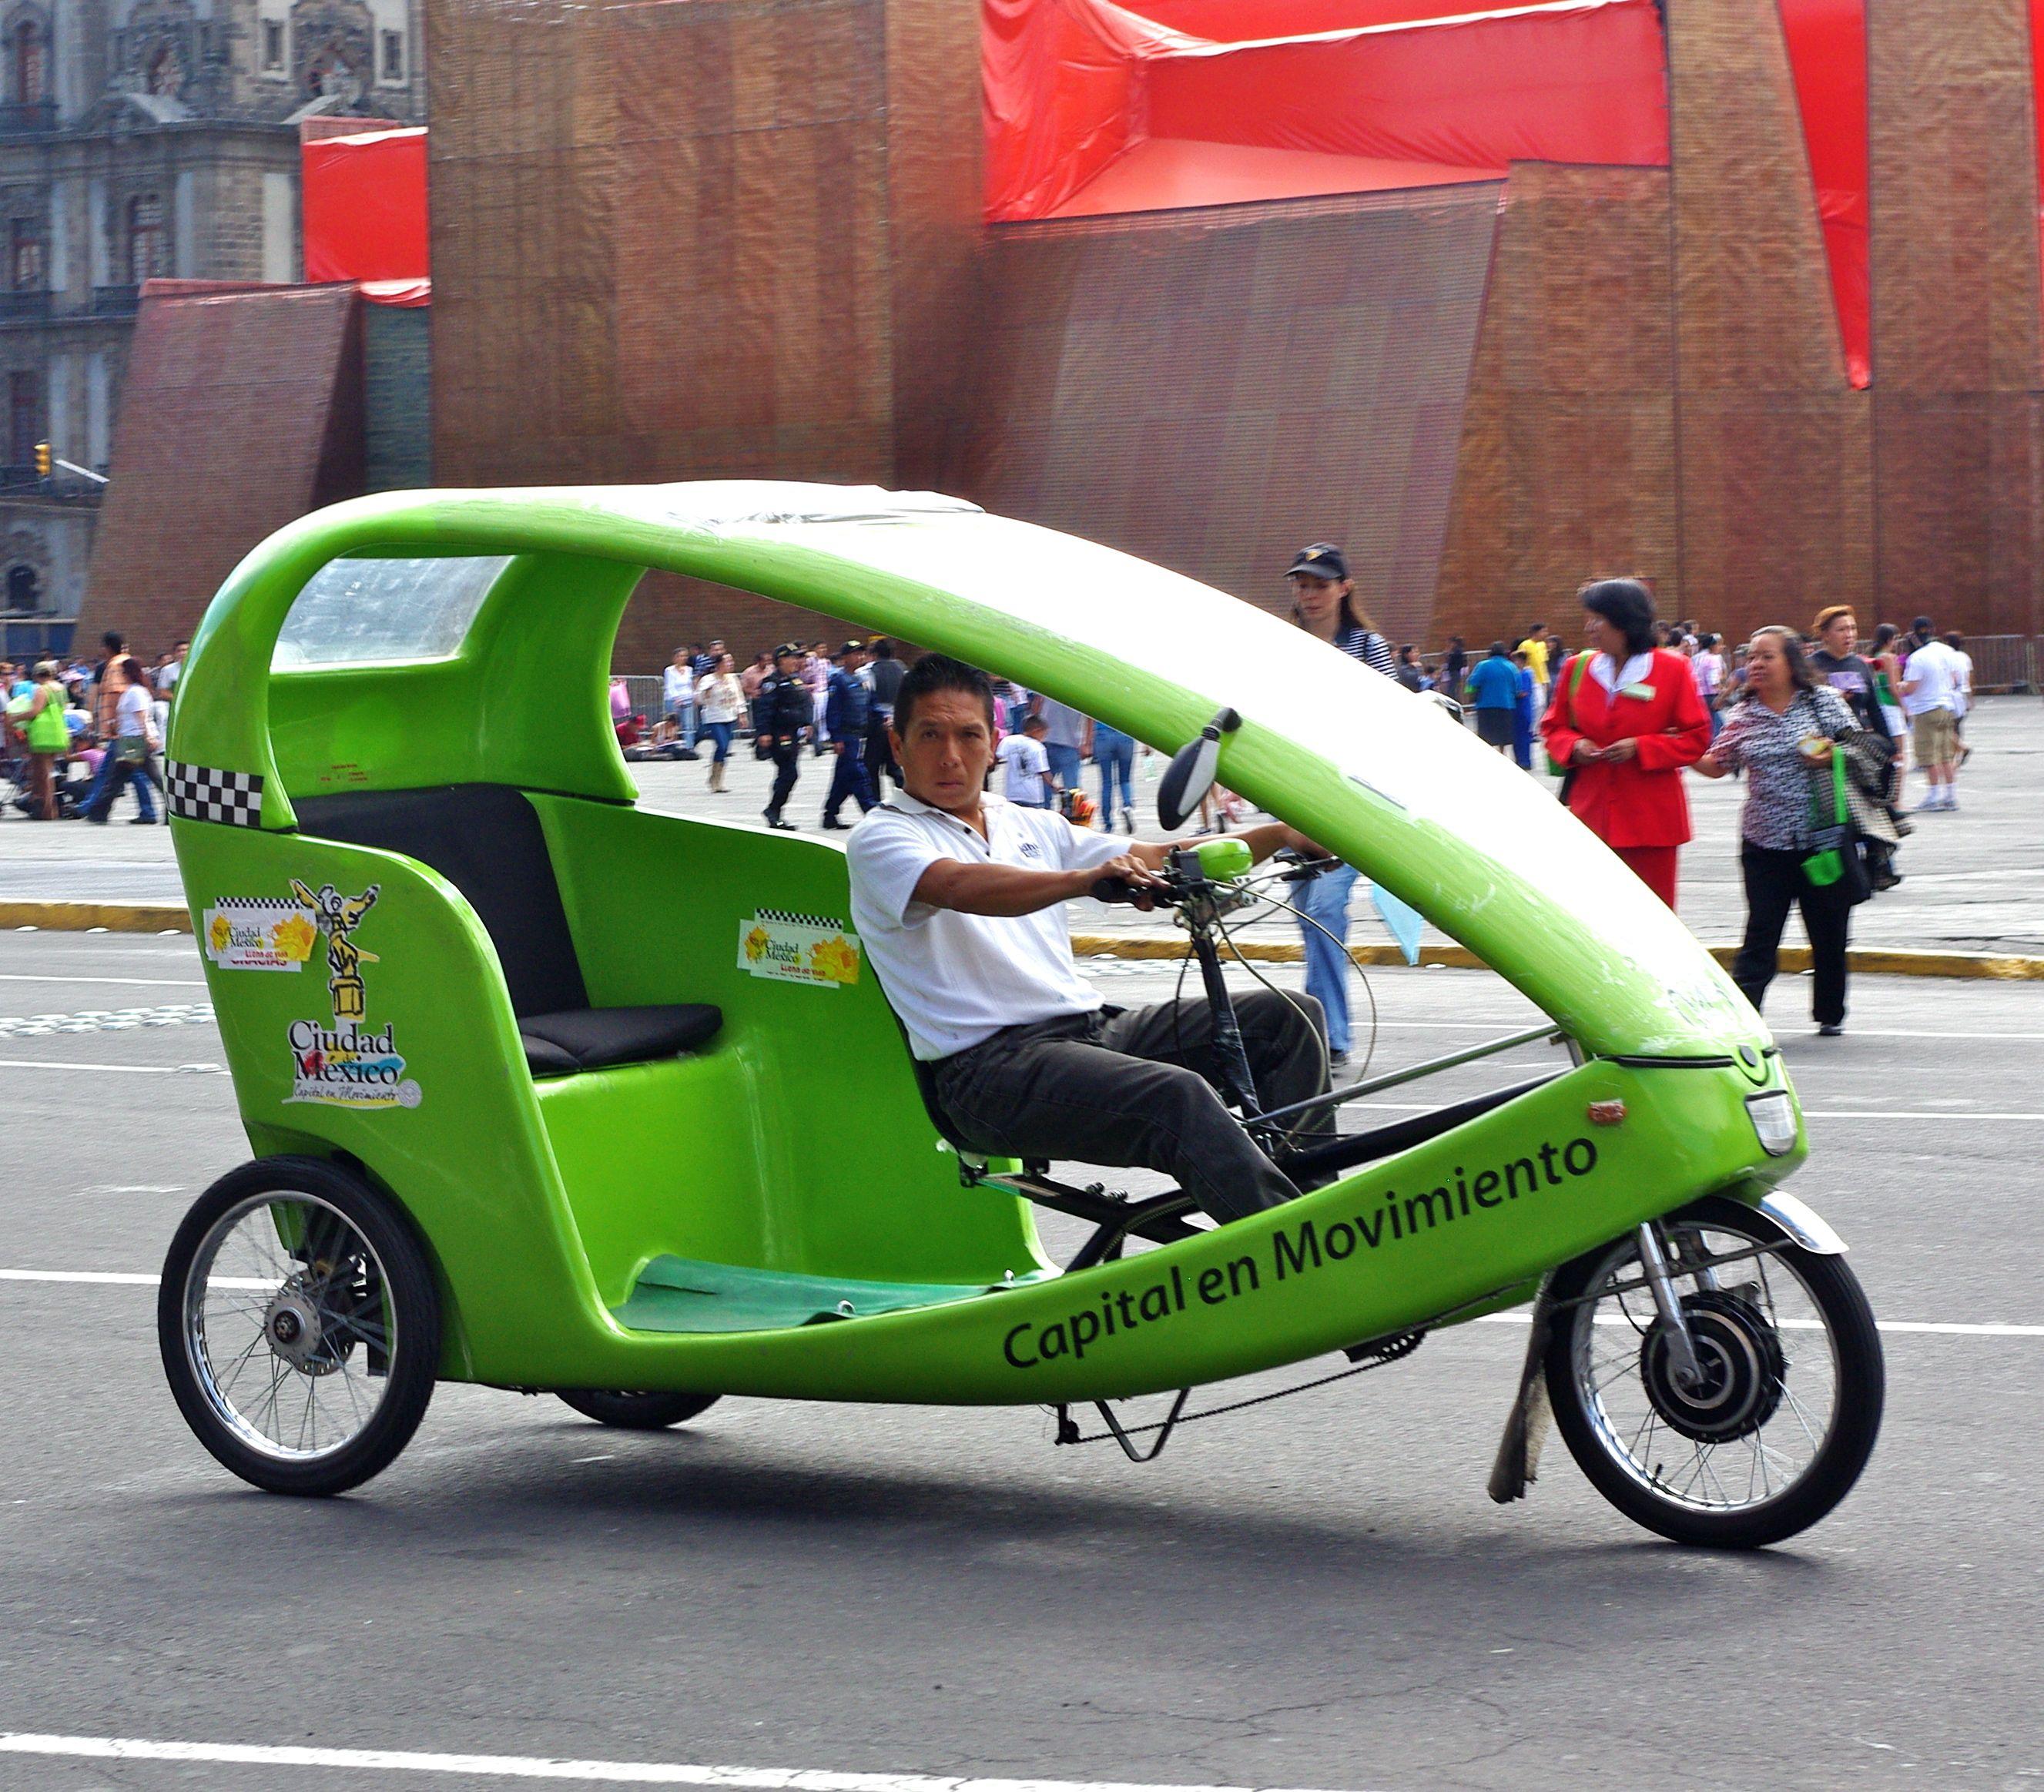 Cycle Rickshaw Wikiwand